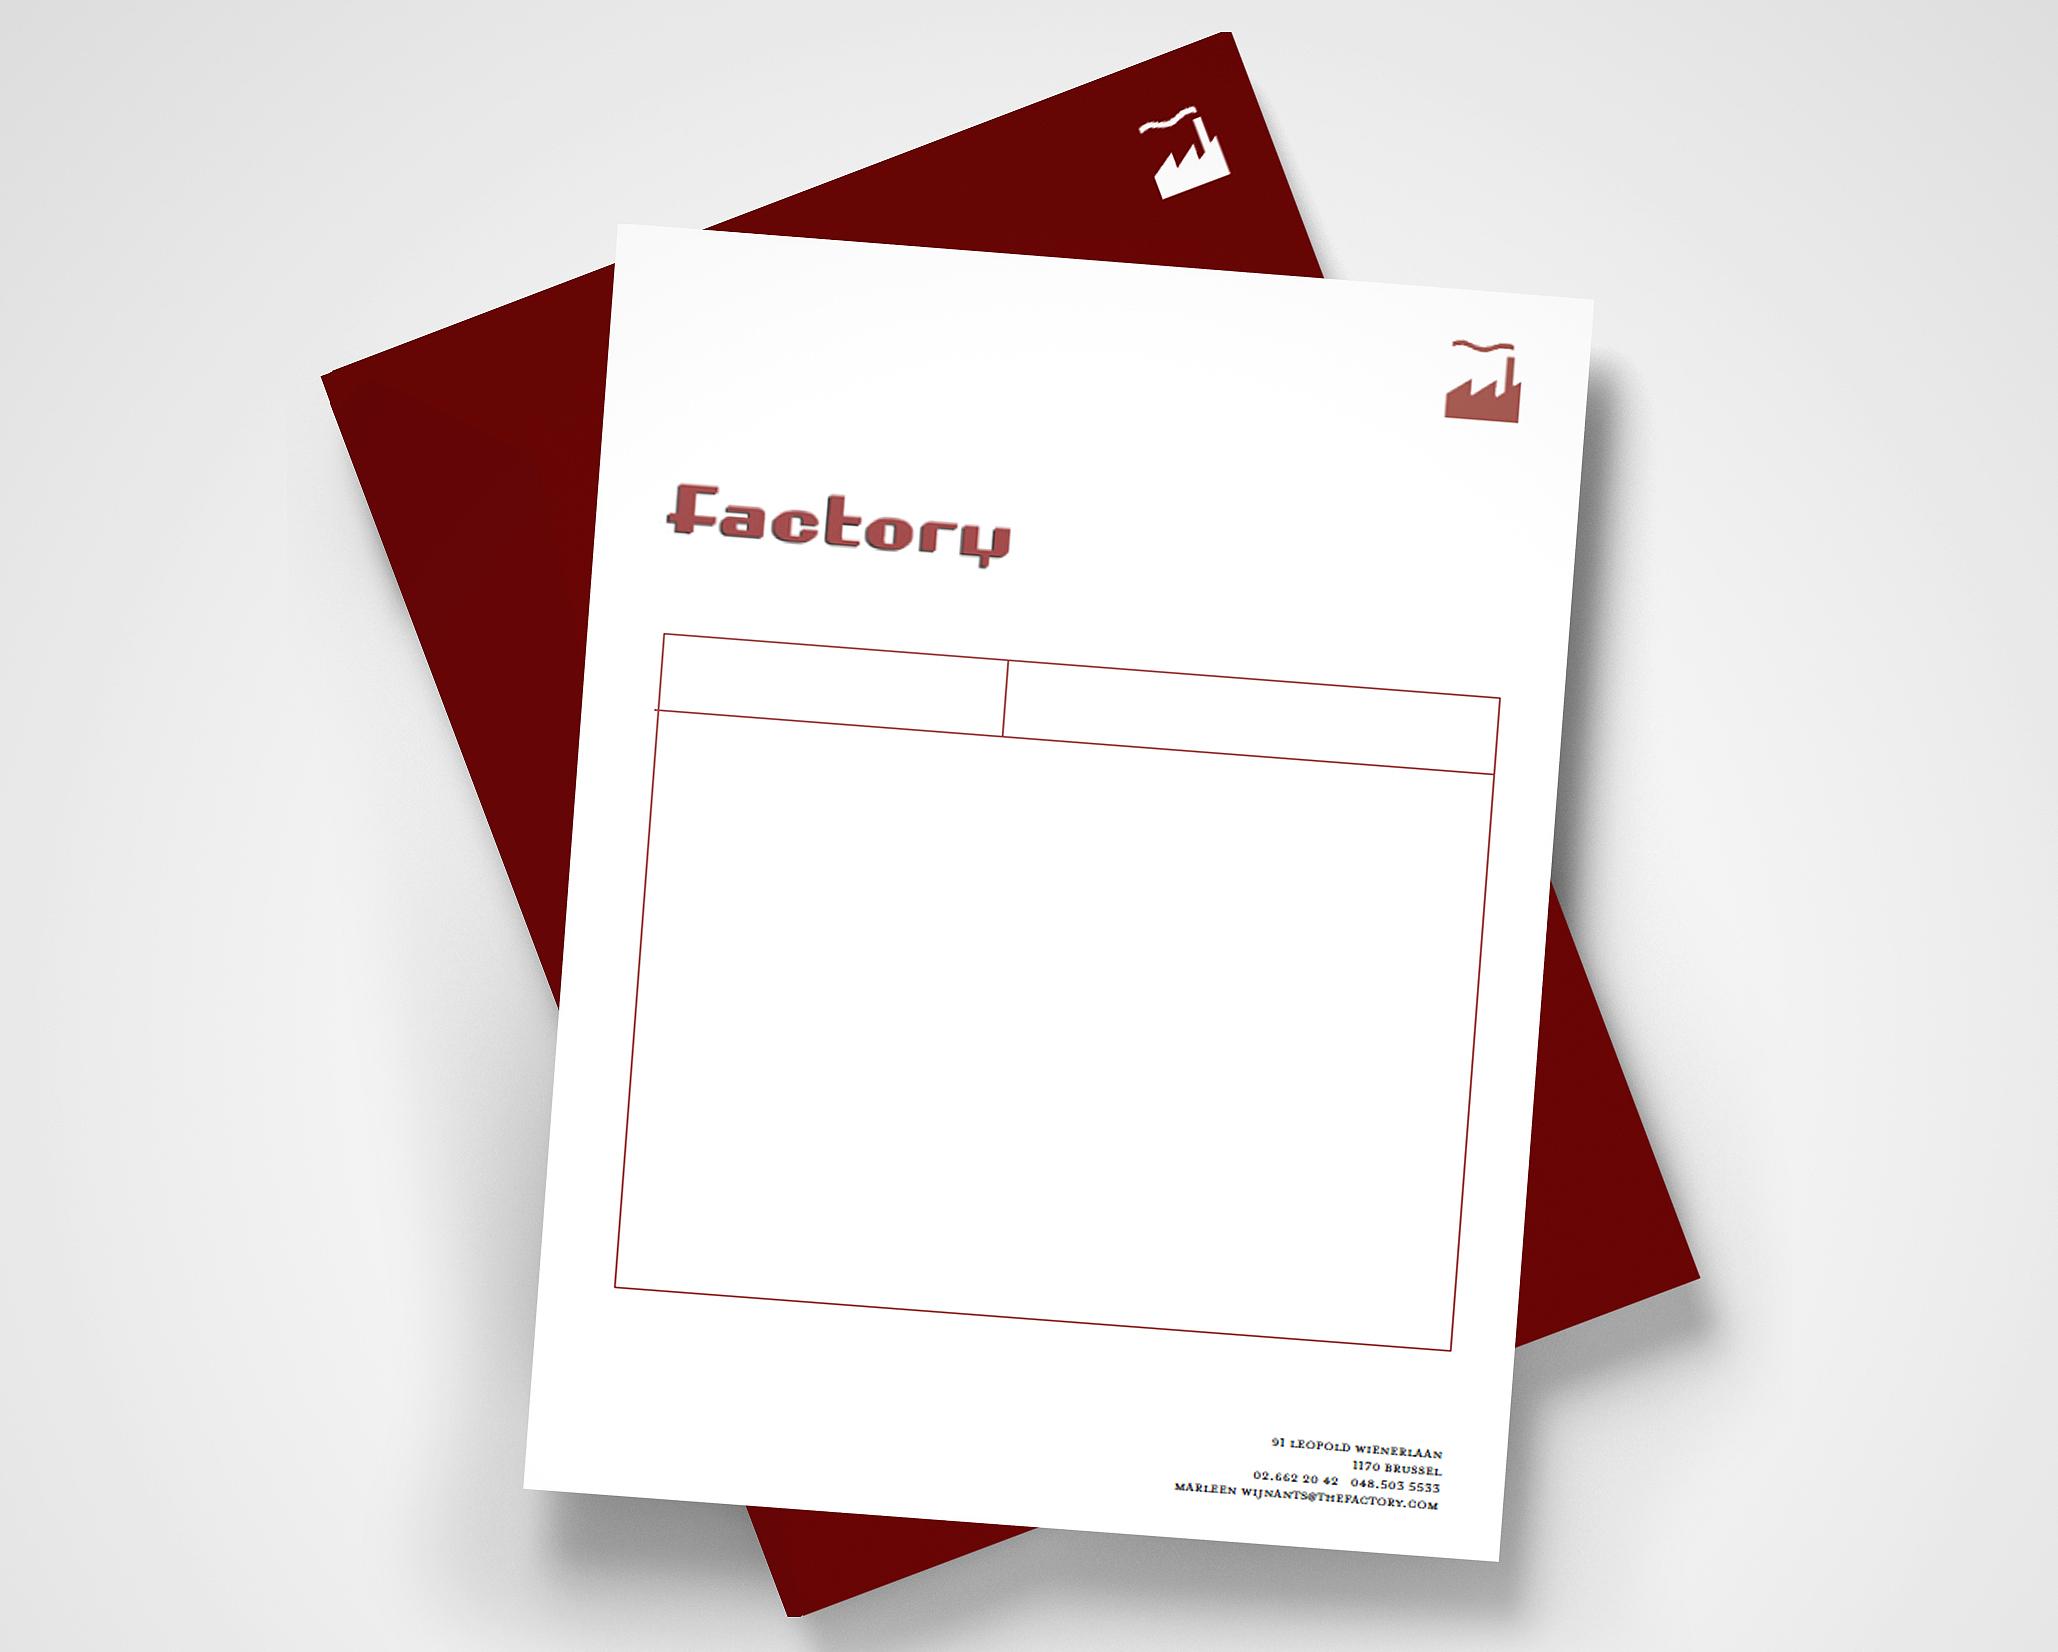 Factory_Letterhead.jpg